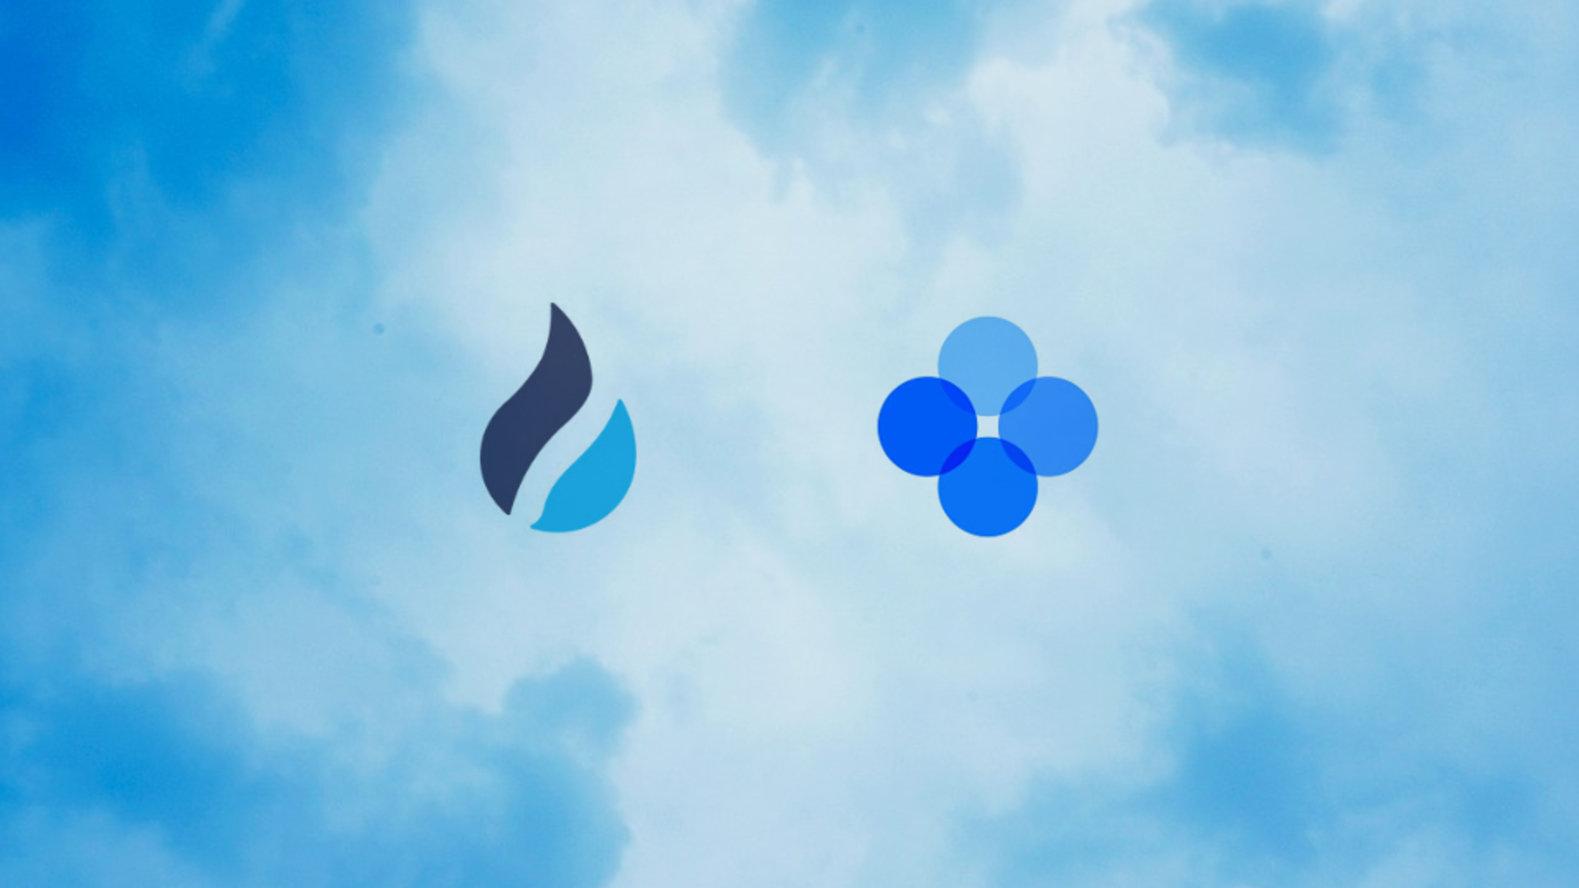 huobi okex 4 stablecoins - 22 میلیون دلار بیت کوین از صرافی Huobi به صرافی OKEx منتقل شد